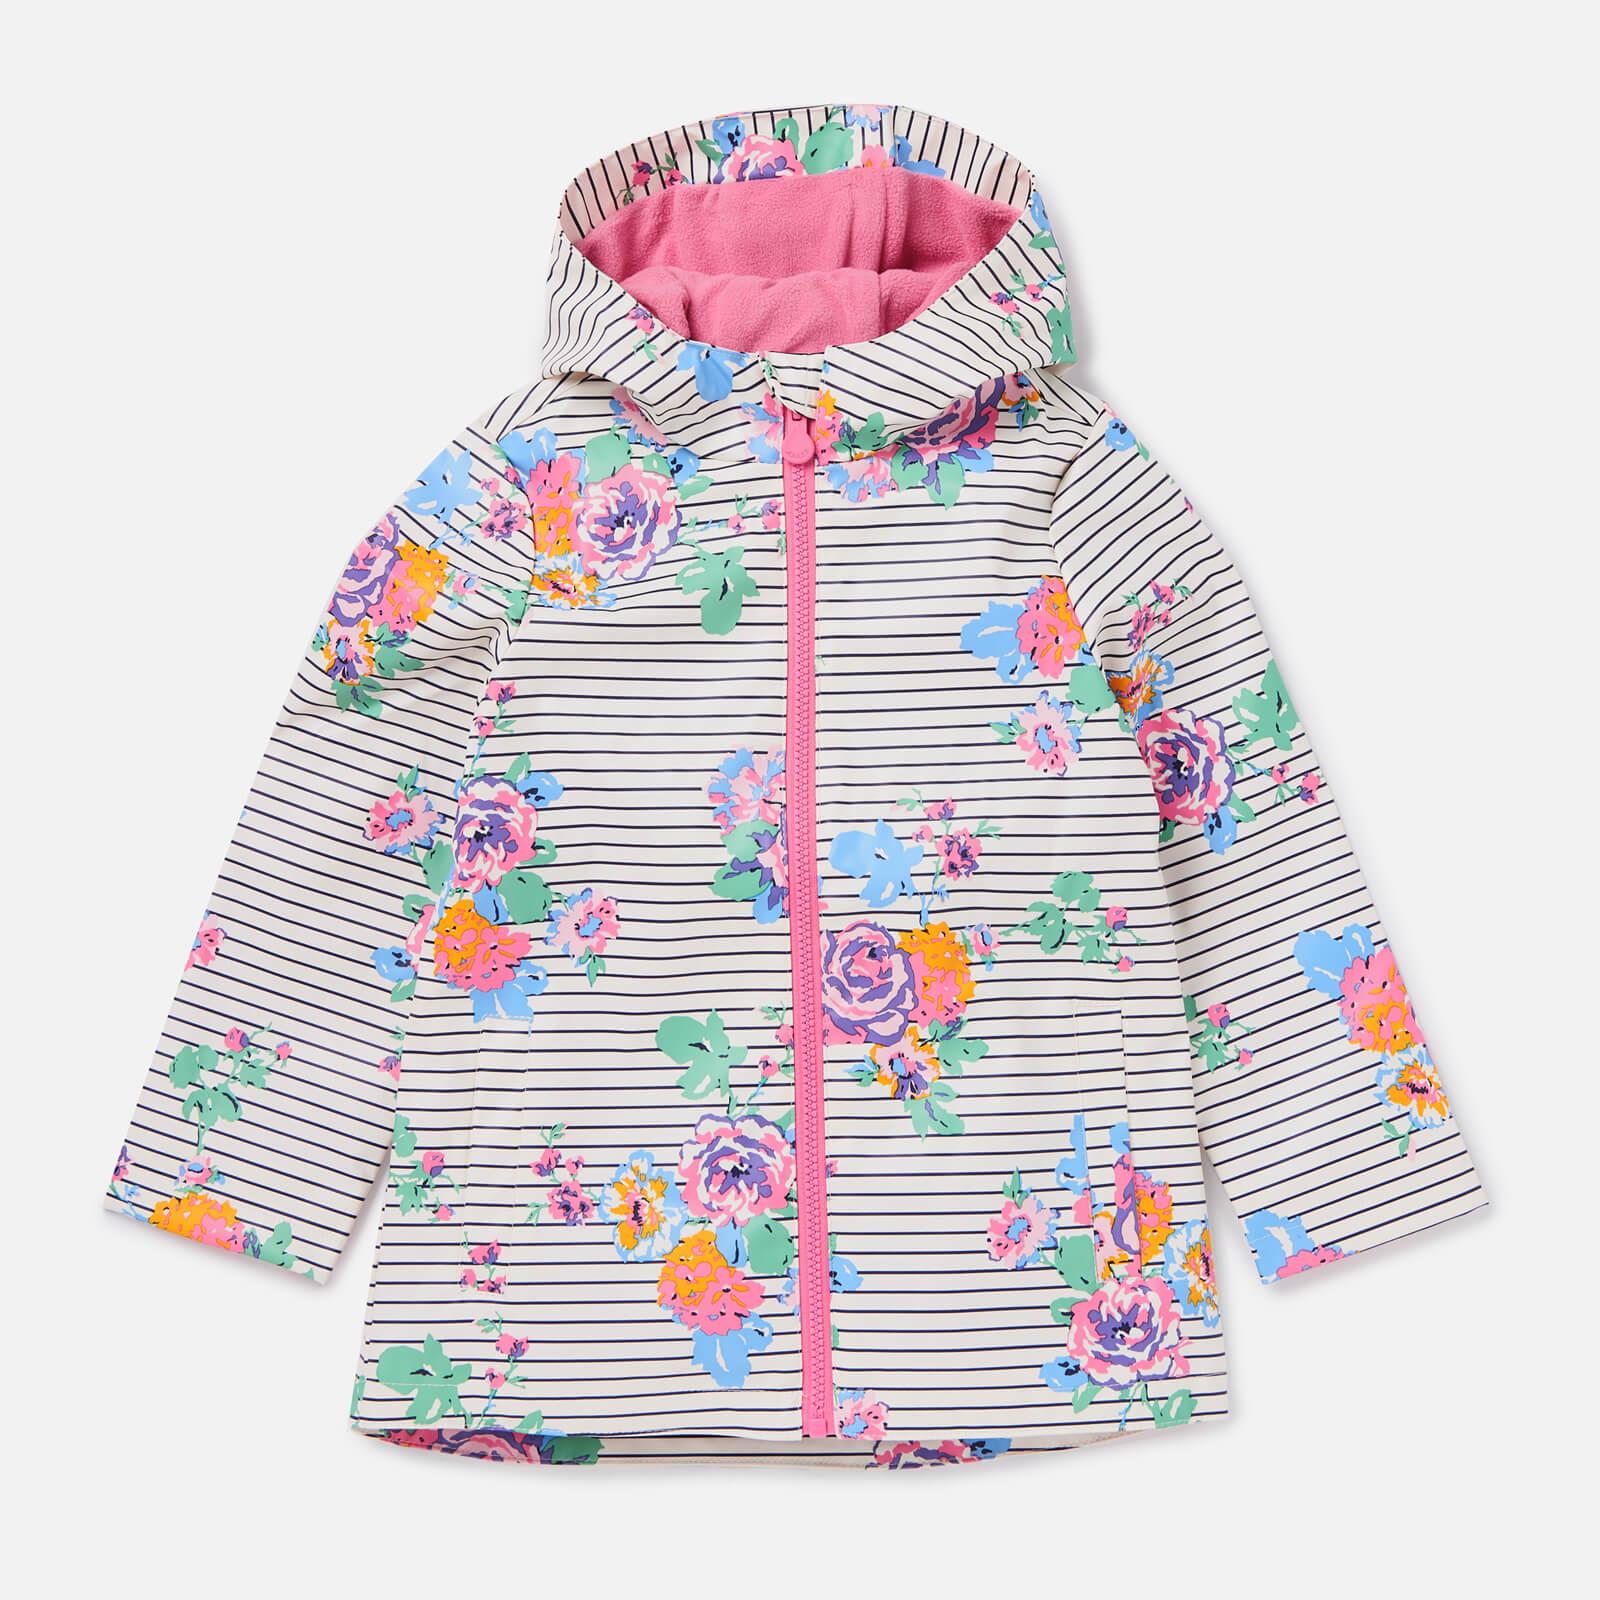 Joules Girls' Raindance Showerproof Rubber Coat - Cream Navy Floral - 4 Years